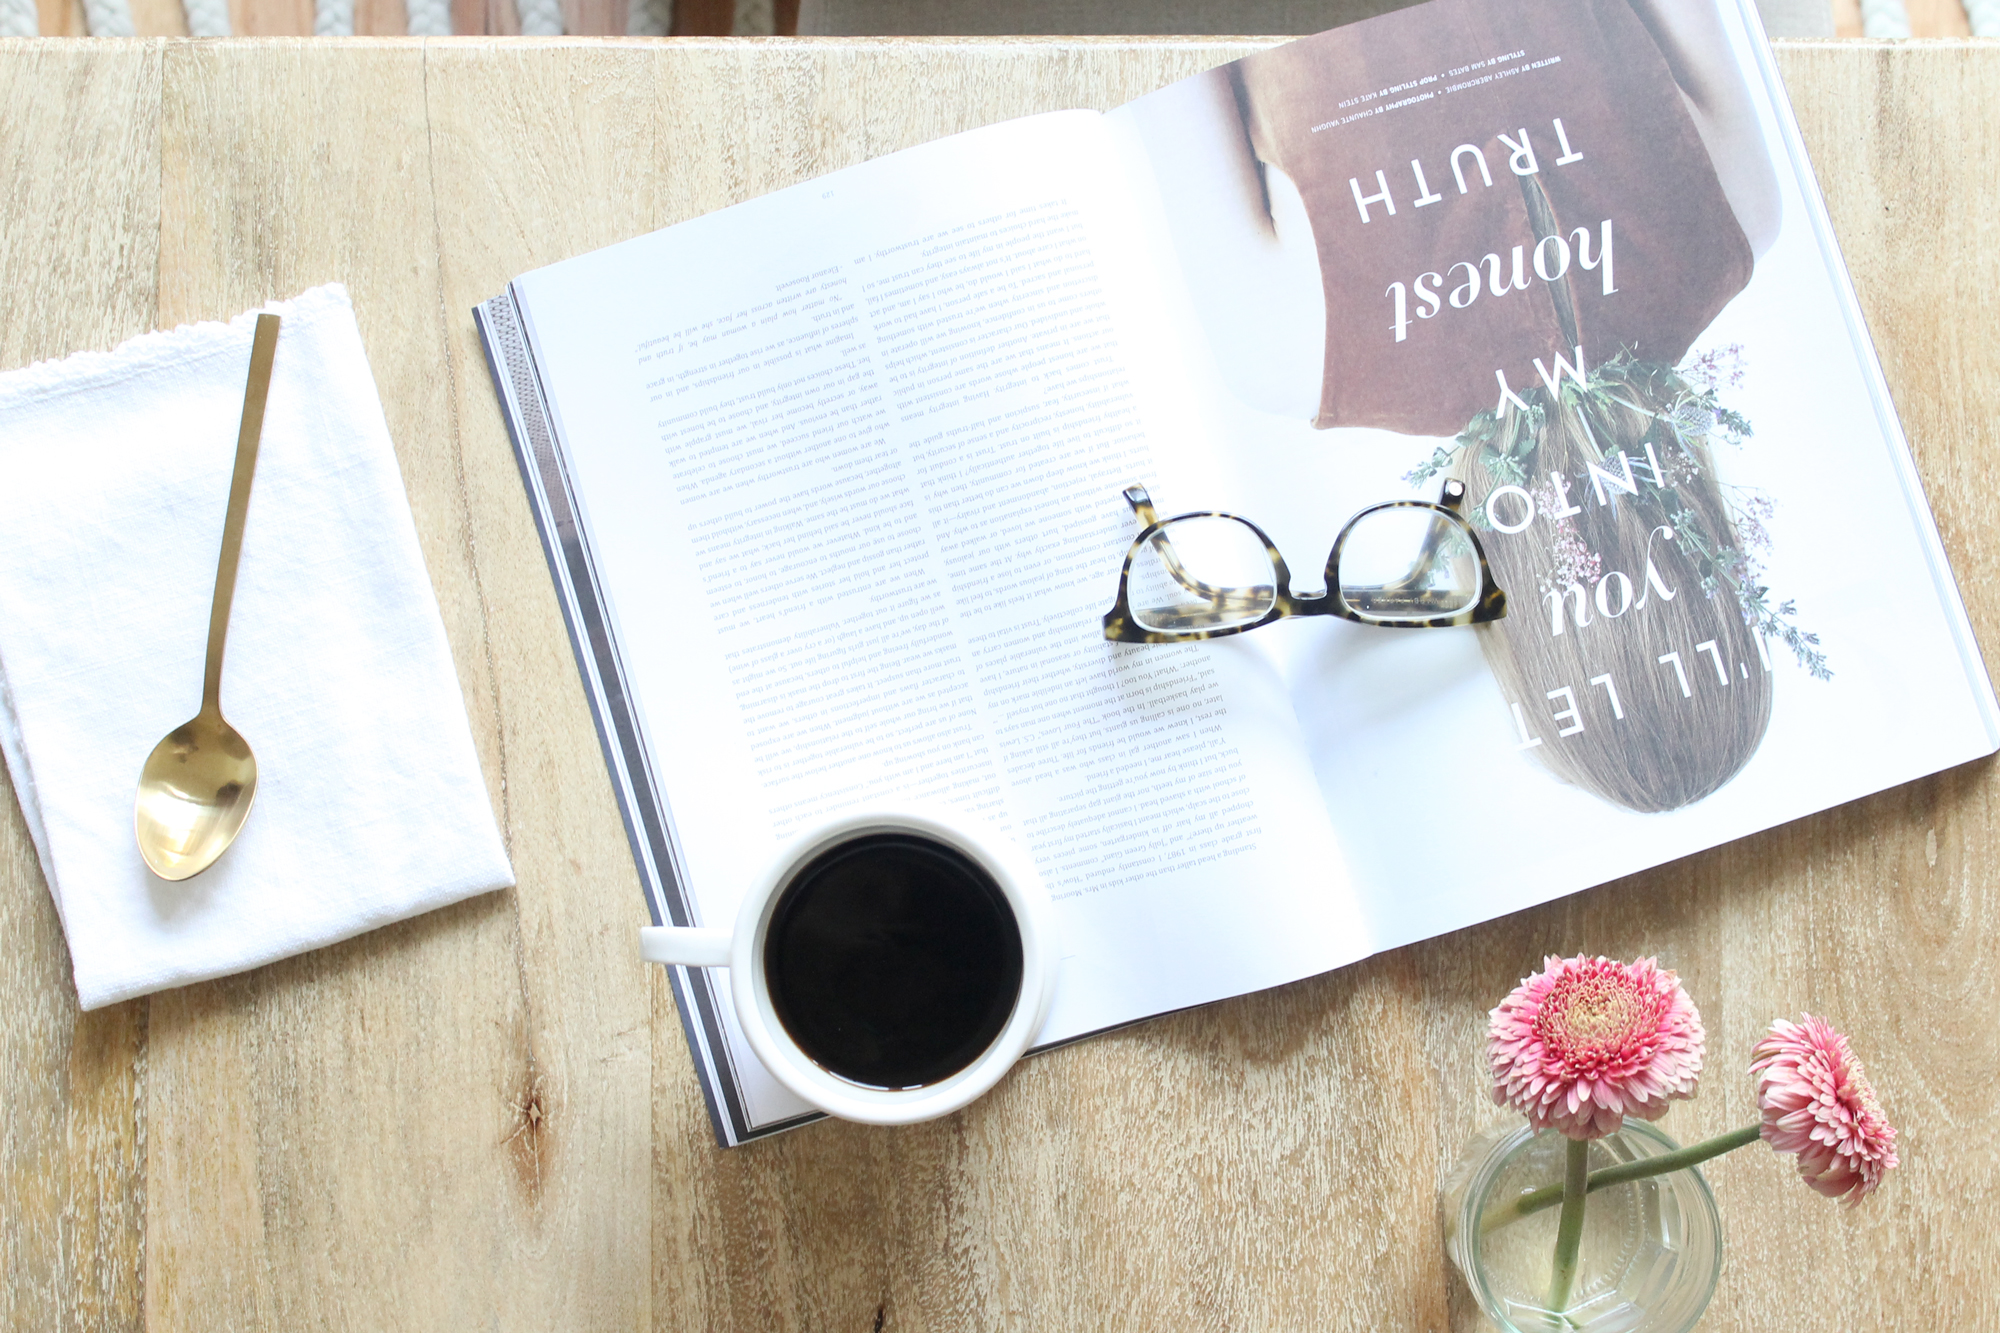 Holiday Pajama Party - SearsStyle Polka Dot Robe, Magazine and Coffee